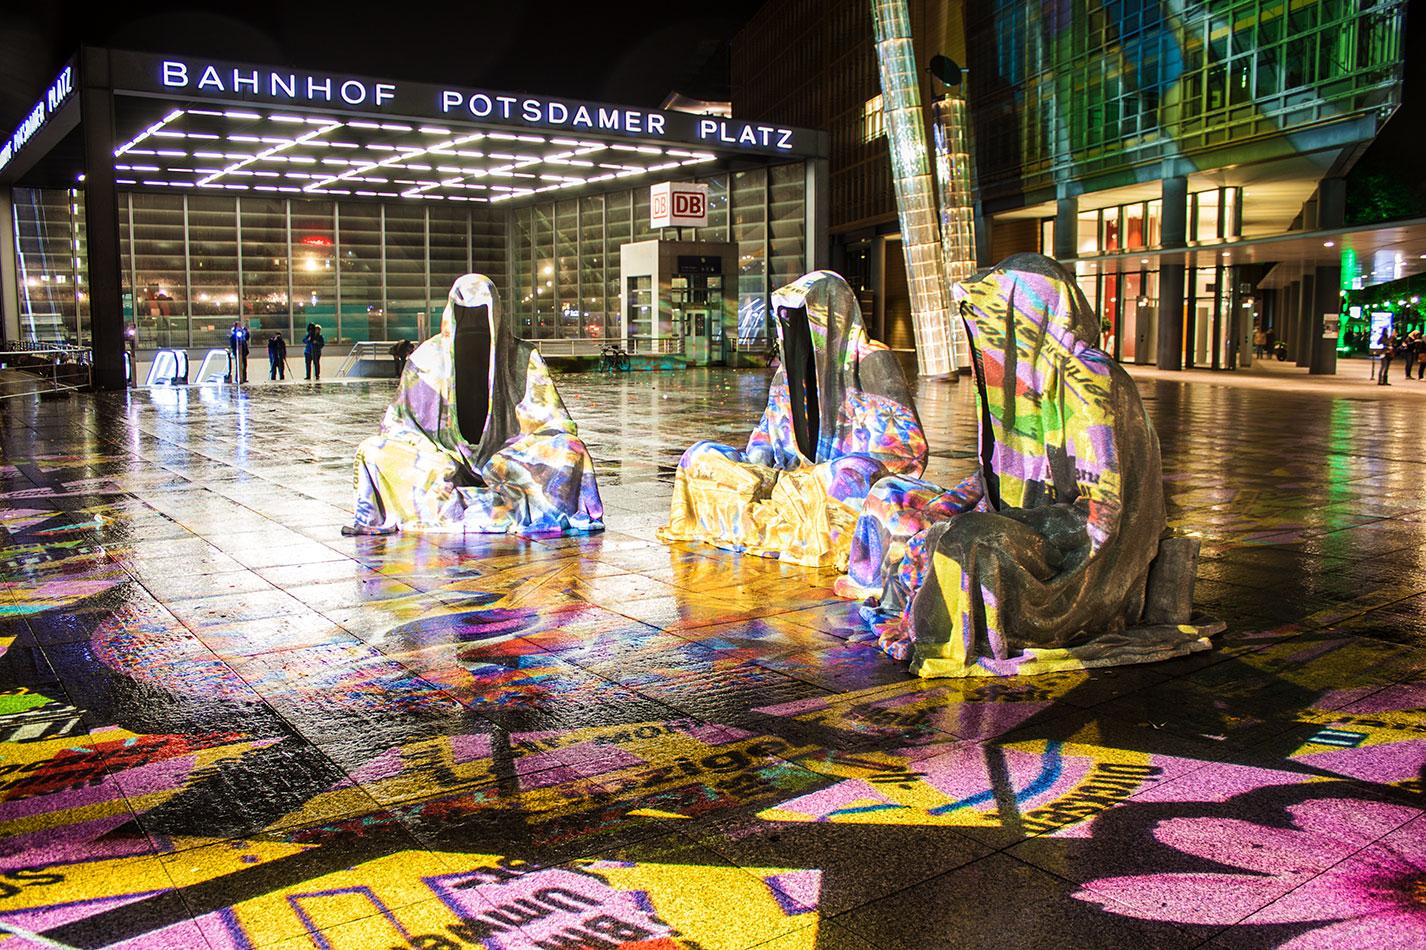 festival-of-lights-berlin-light-art-festival-contemporary-fine-art-design-show-large-scale-sculpture-guardiansof-time-manfred-kili-kielnhofer-sculpture-3856